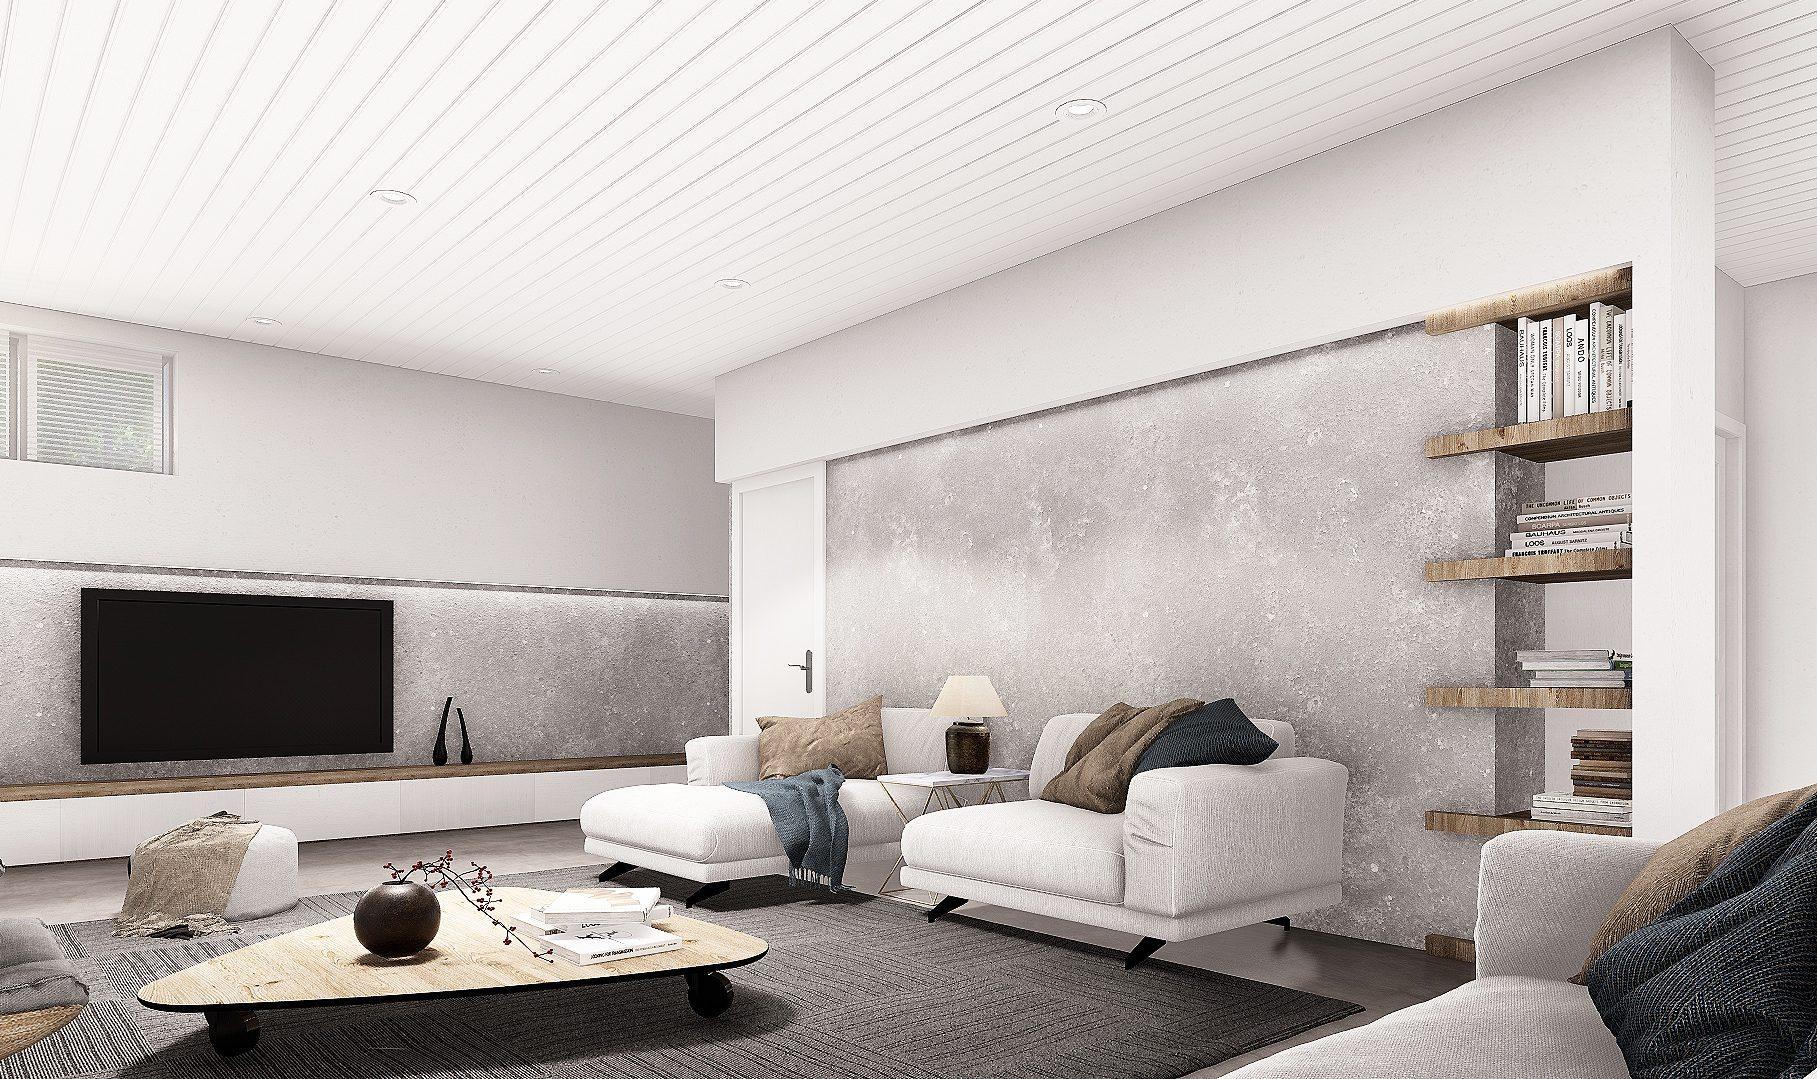 Normerica Timber Frames, House Plan, The Laurentian, Interior, Basement 2